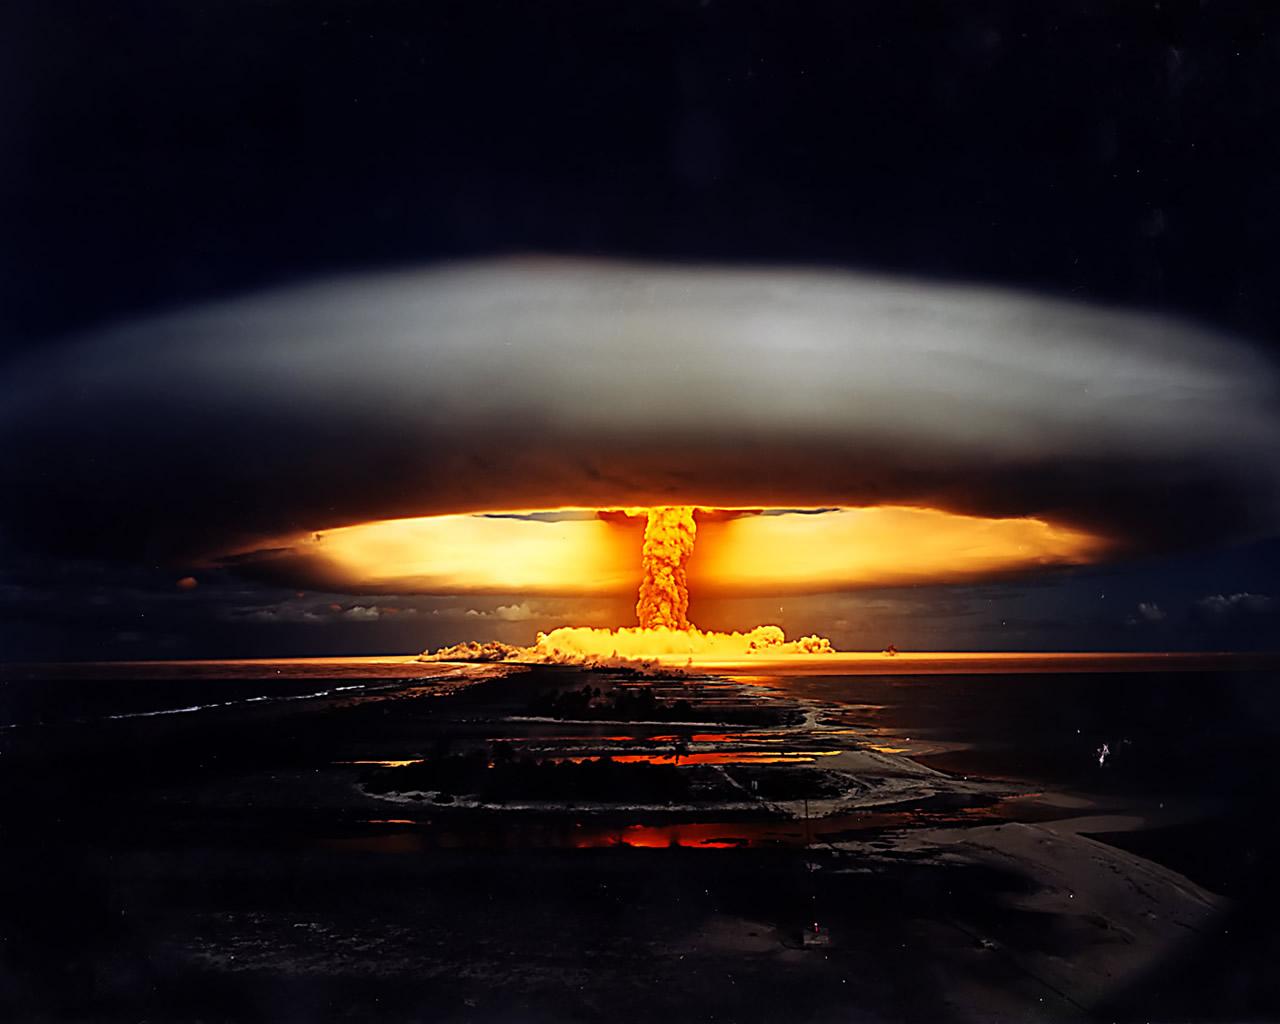 http://1.bp.blogspot.com/--nlDl4LKlK0/TlFkyVAD6oI/AAAAAAAAAE4/0s6SNWiZSz4/s1600/Explosion+Nuclear.jpg